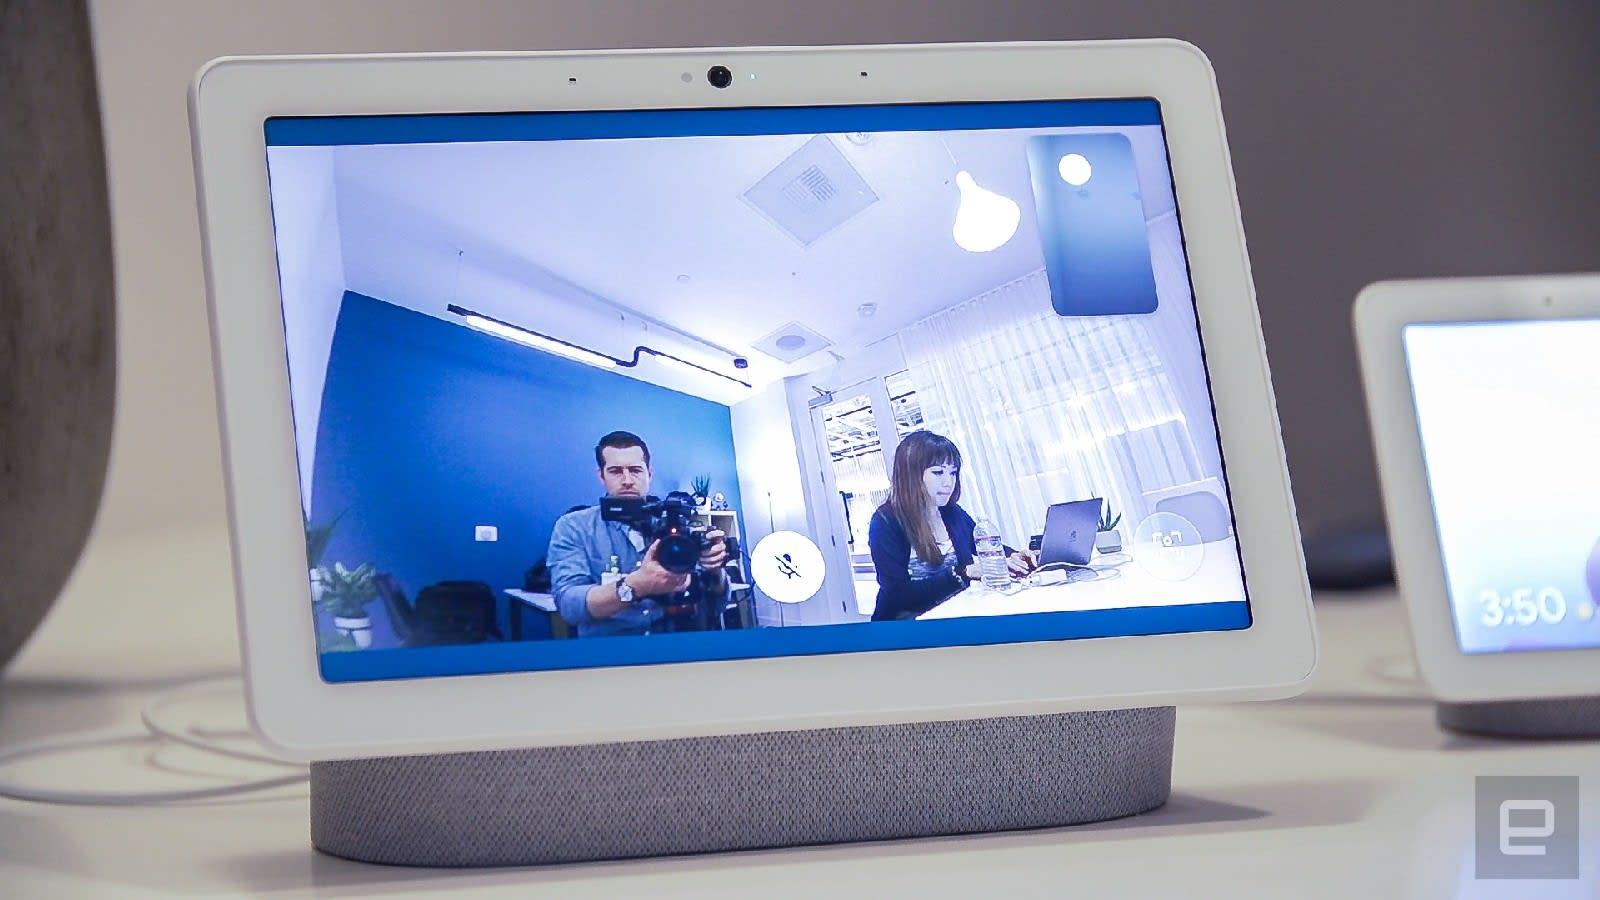 Google Nest Hub Max hands-on